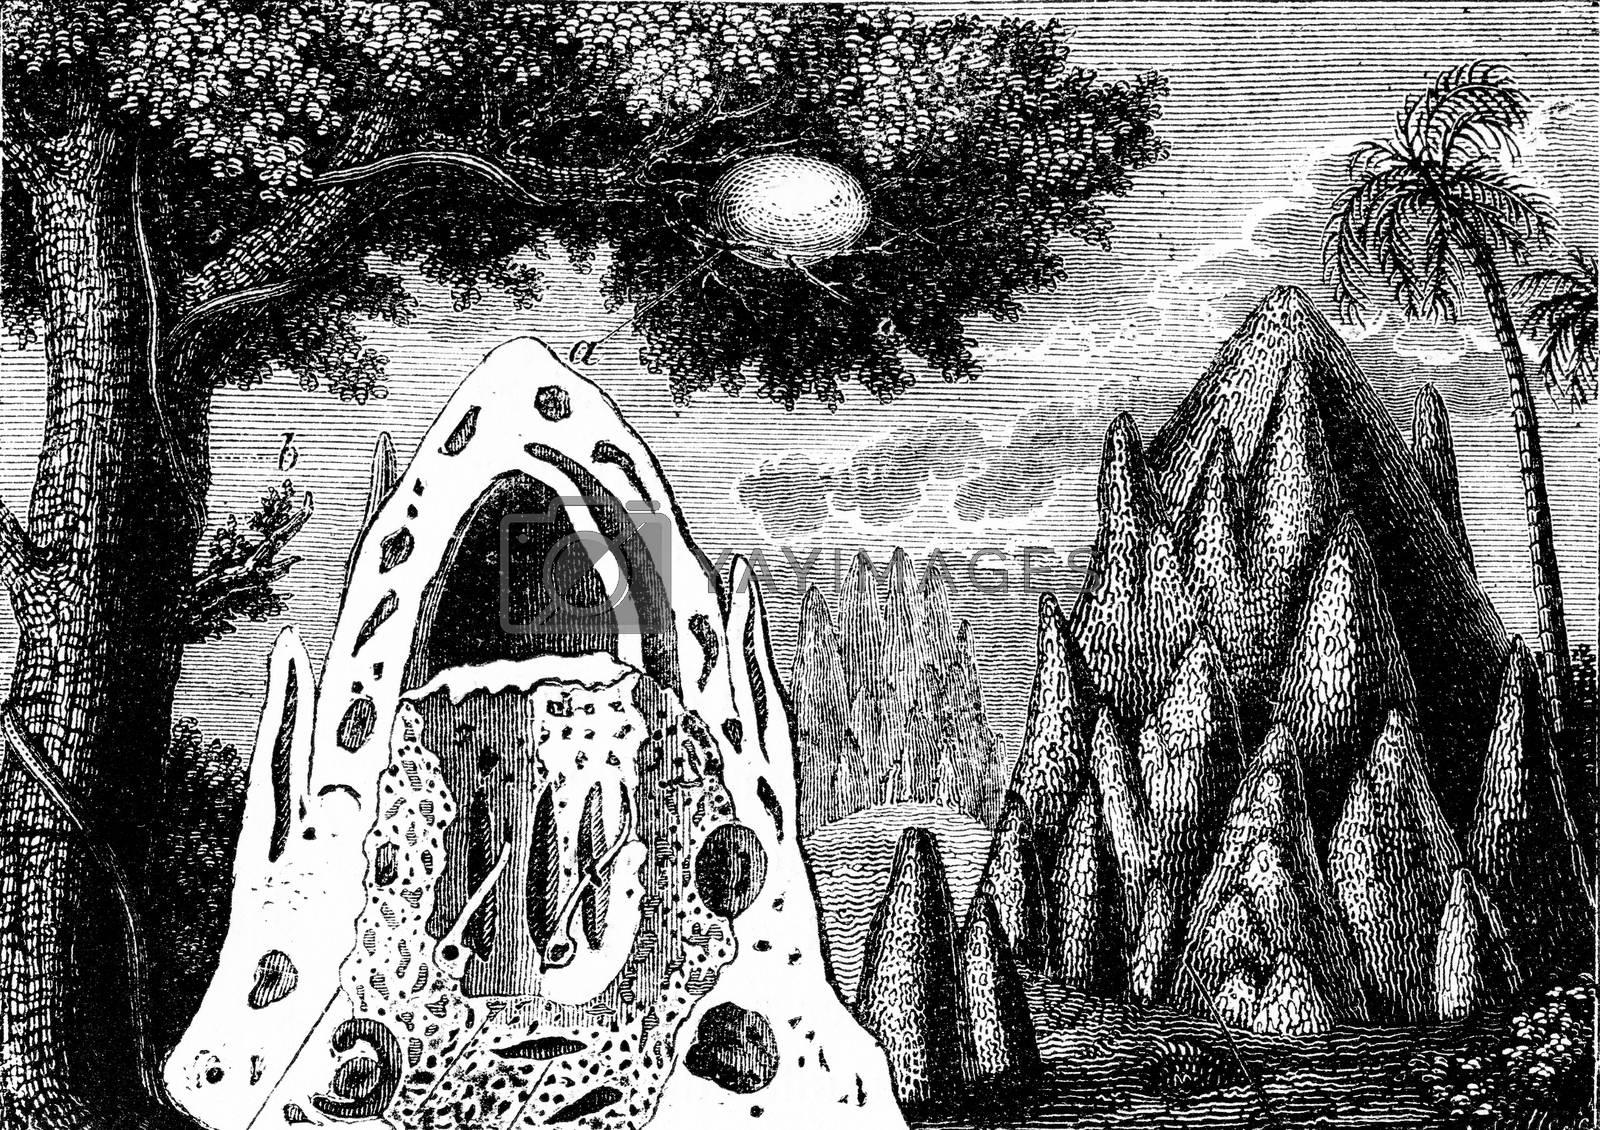 Termite nests, vintage engraving. by Morphart